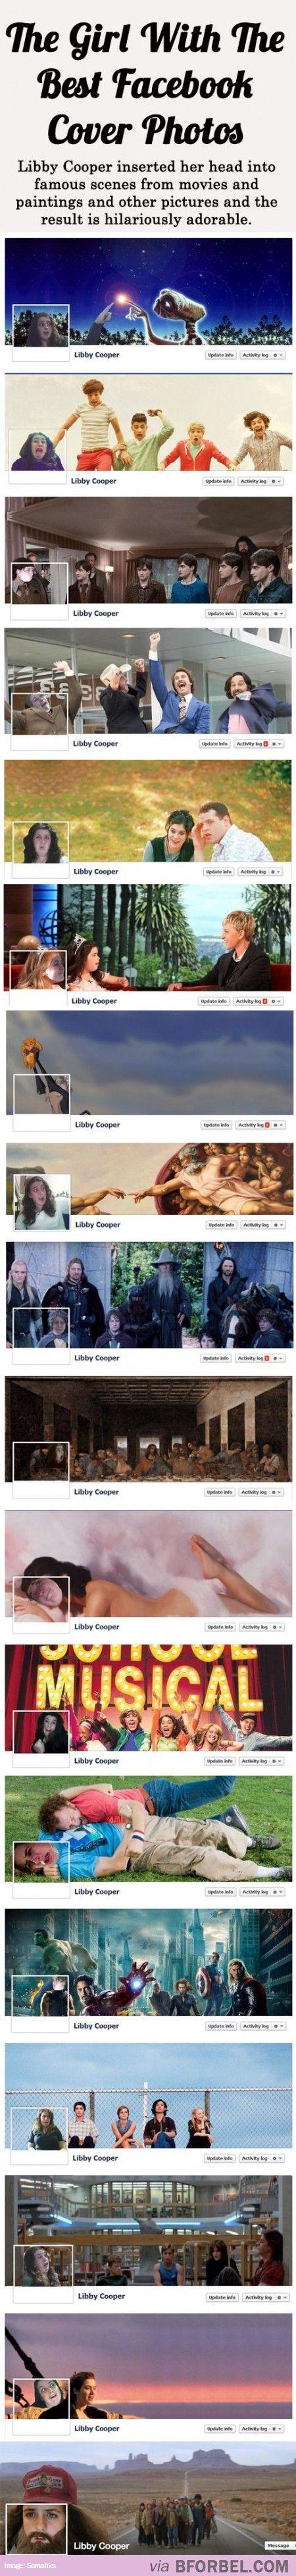 The Girl With The Hilariously Adorable Facebook Cover Photos.